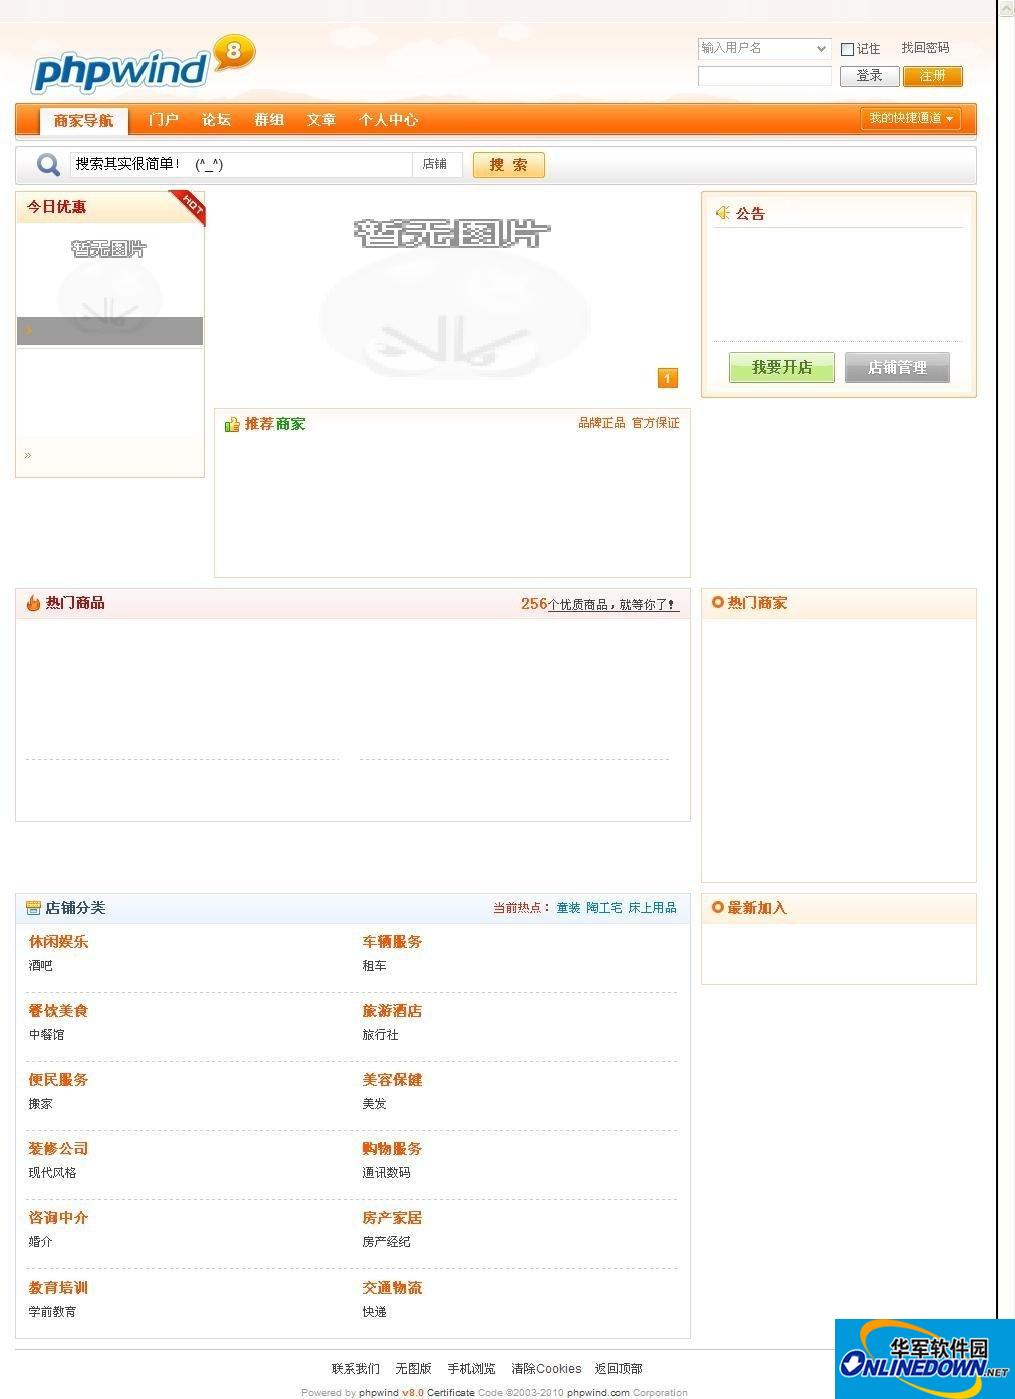 phpwind 商家导航 PC版